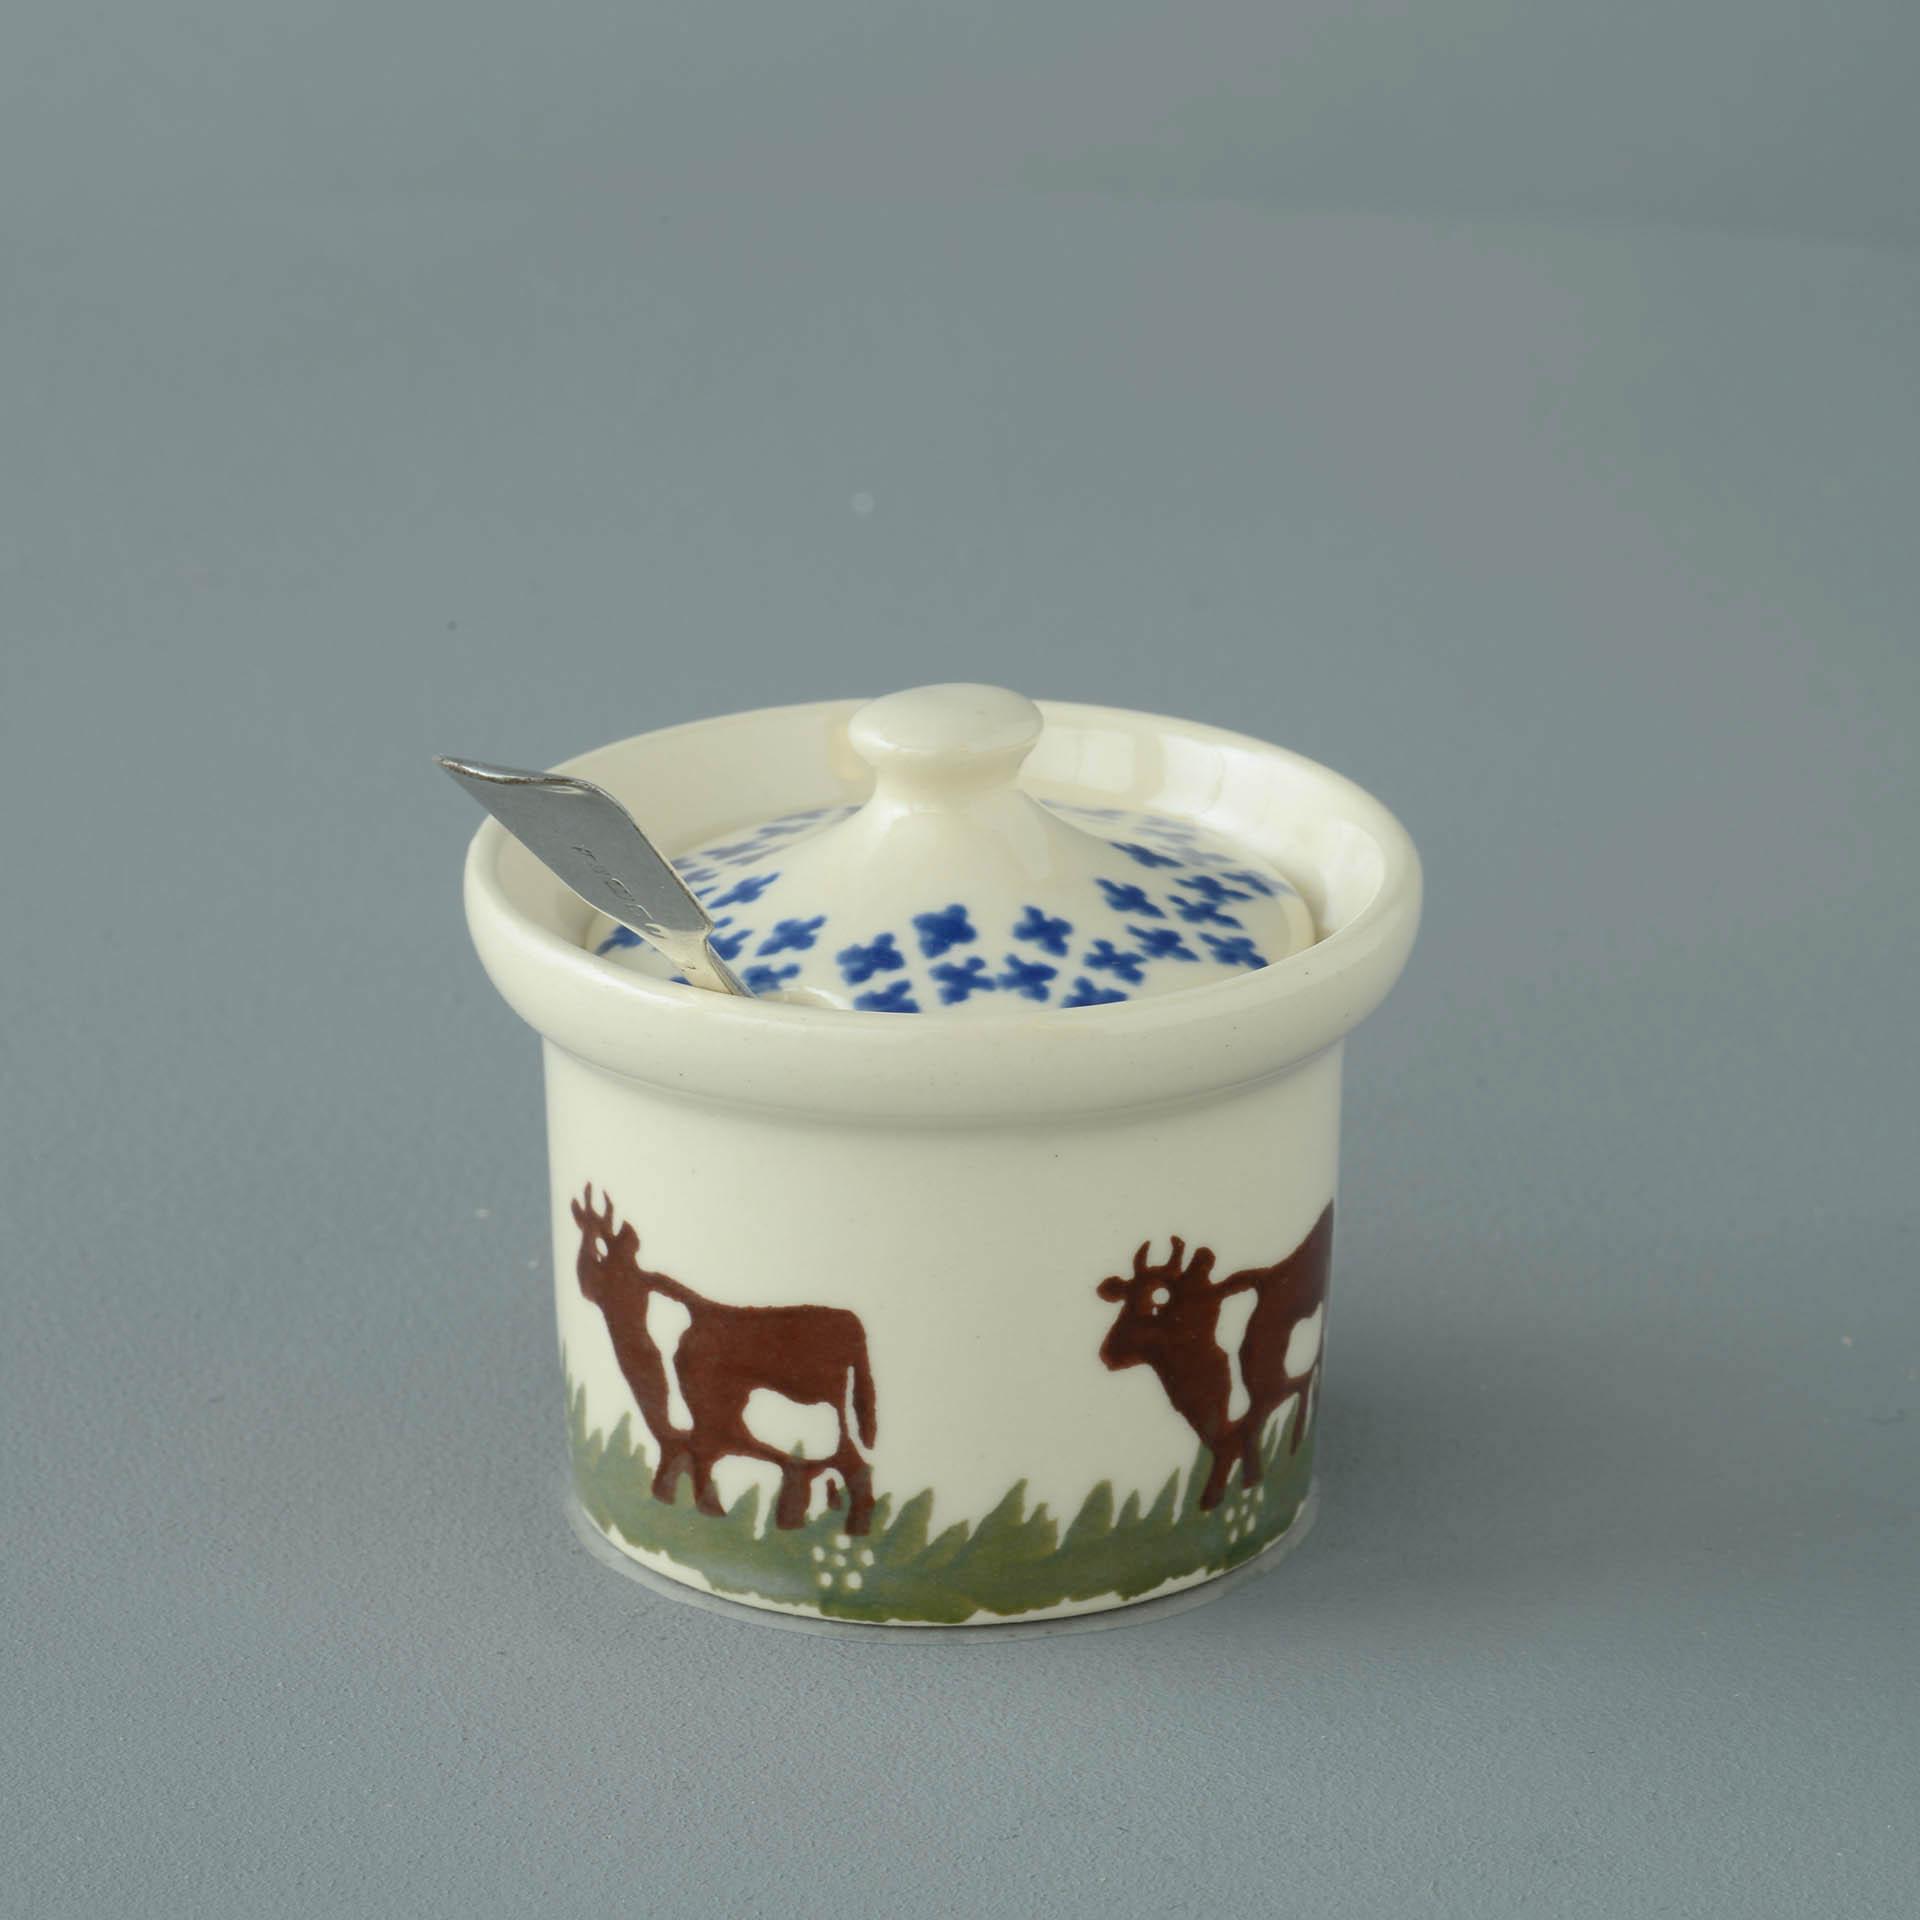 Cows Mustard Pot 7.8(w) x 5.4(h) cm